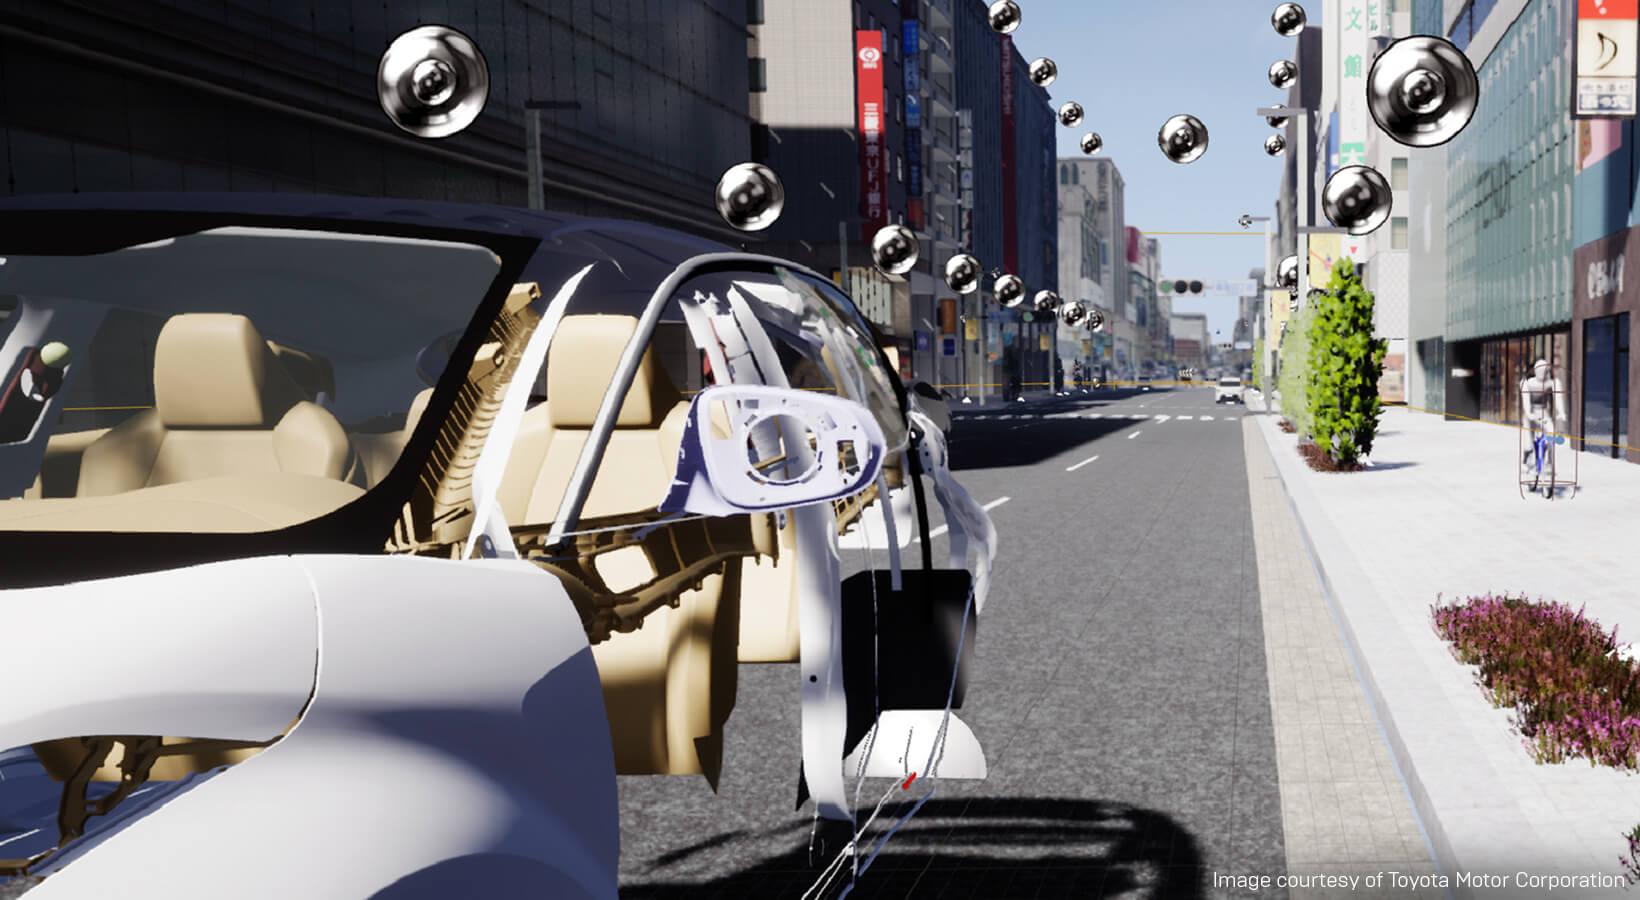 Spotlight_Toyota_Blog_Body_Image_1.jpg